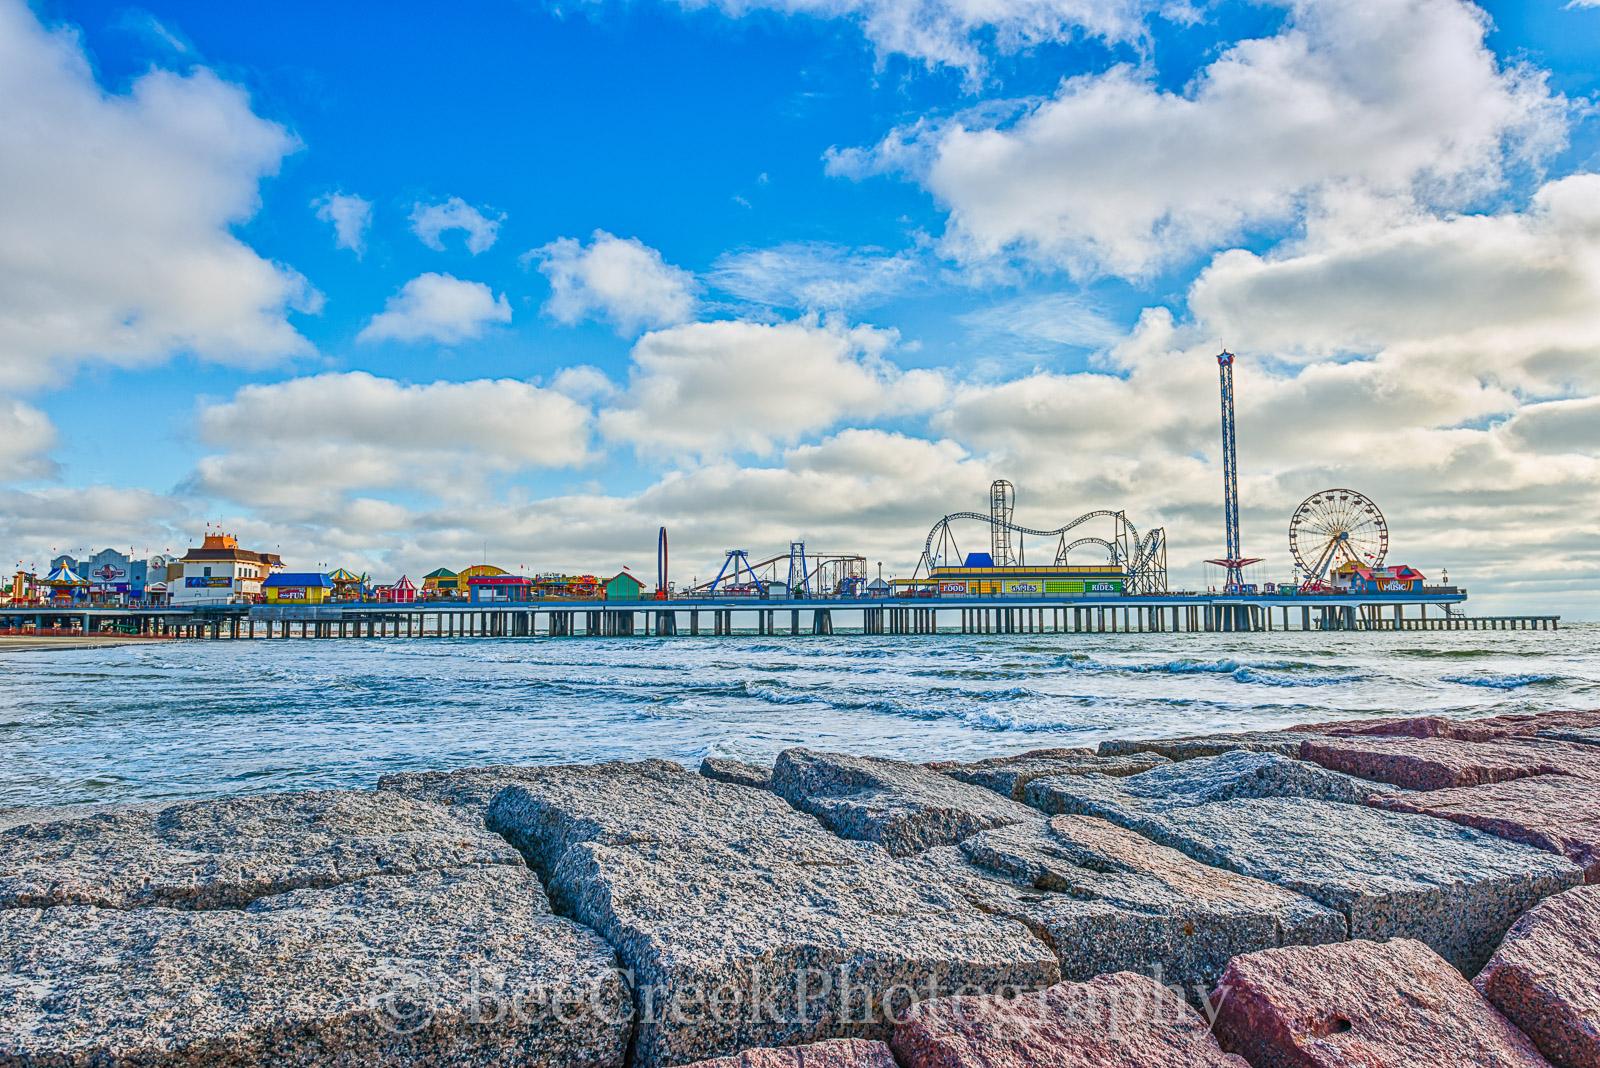 Fun Pier, Galveston, Pleasure Pier, amusement park, beach, breakers, city, coast, family entertainment, granite, island, night, party, seascape, tourist, water, photo